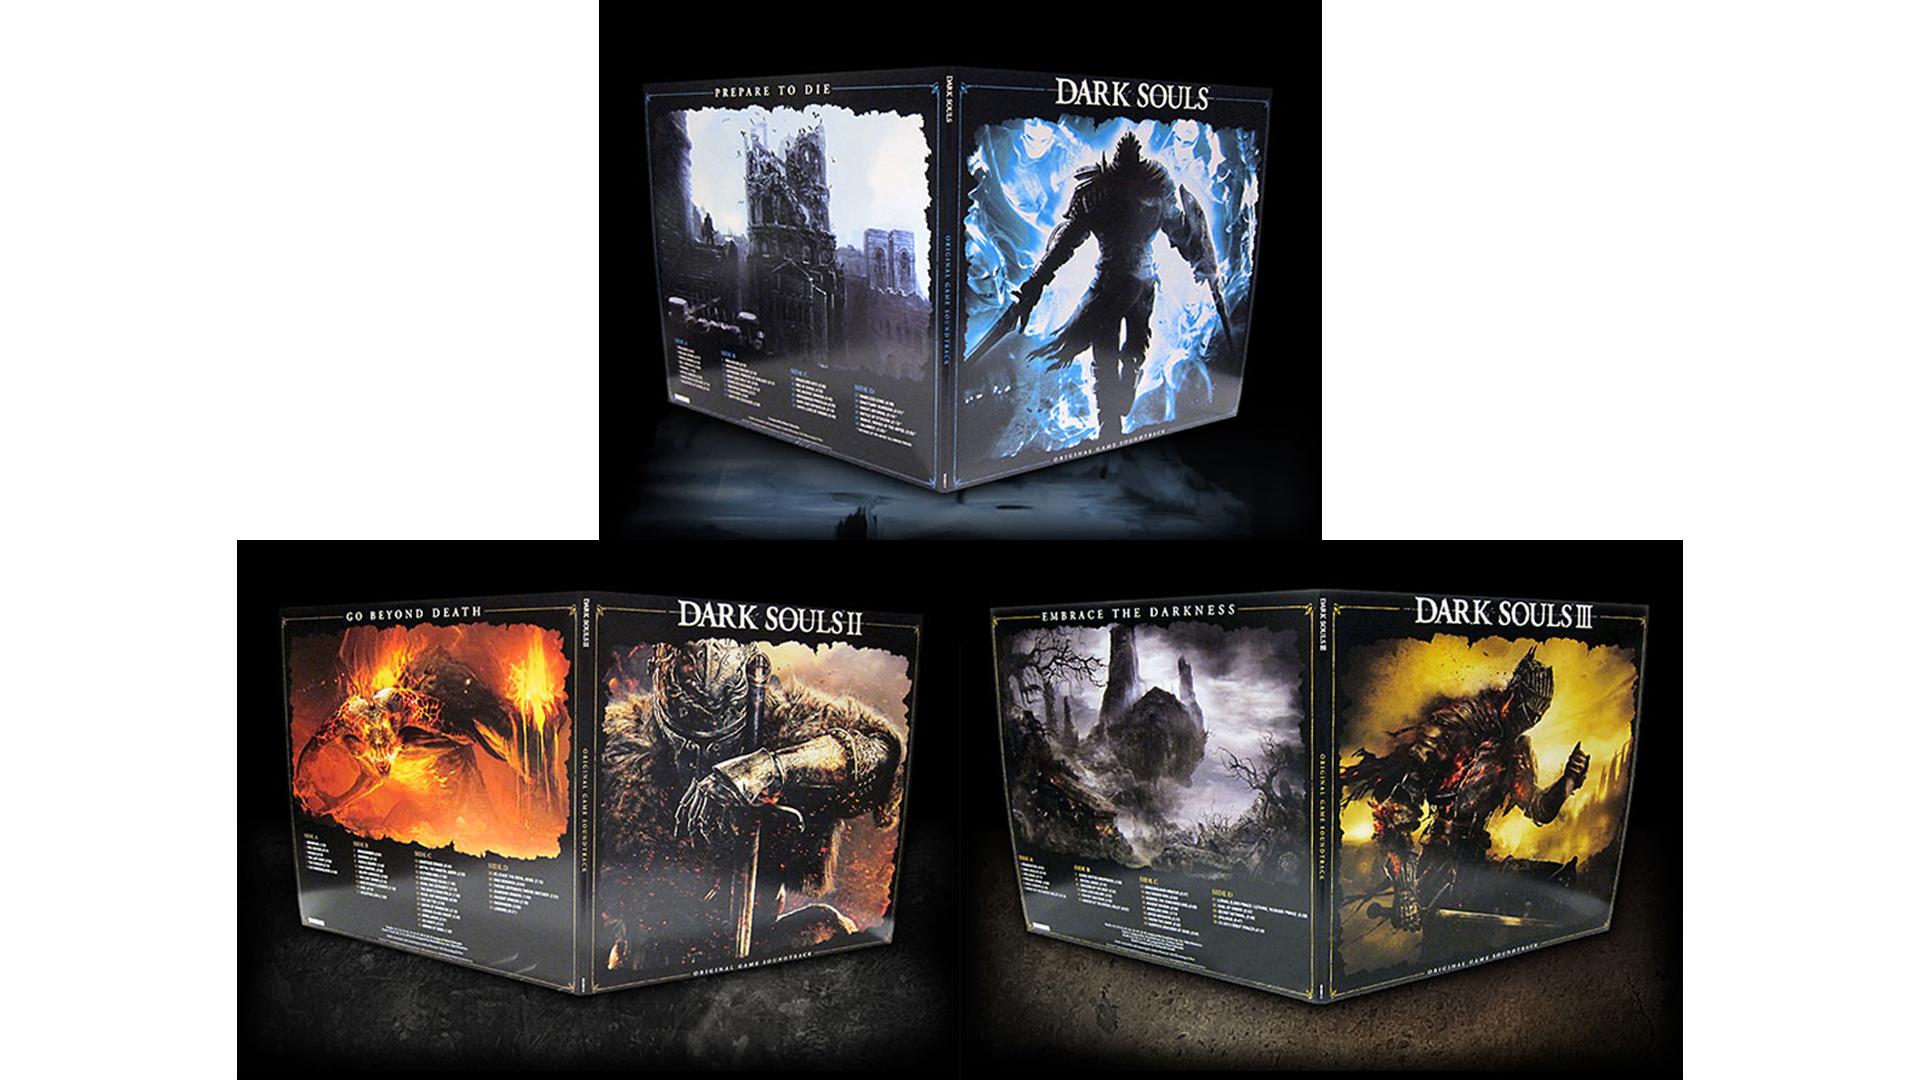 This week's best gaming deals: Nier Automata, Dark Souls Vinyl, The